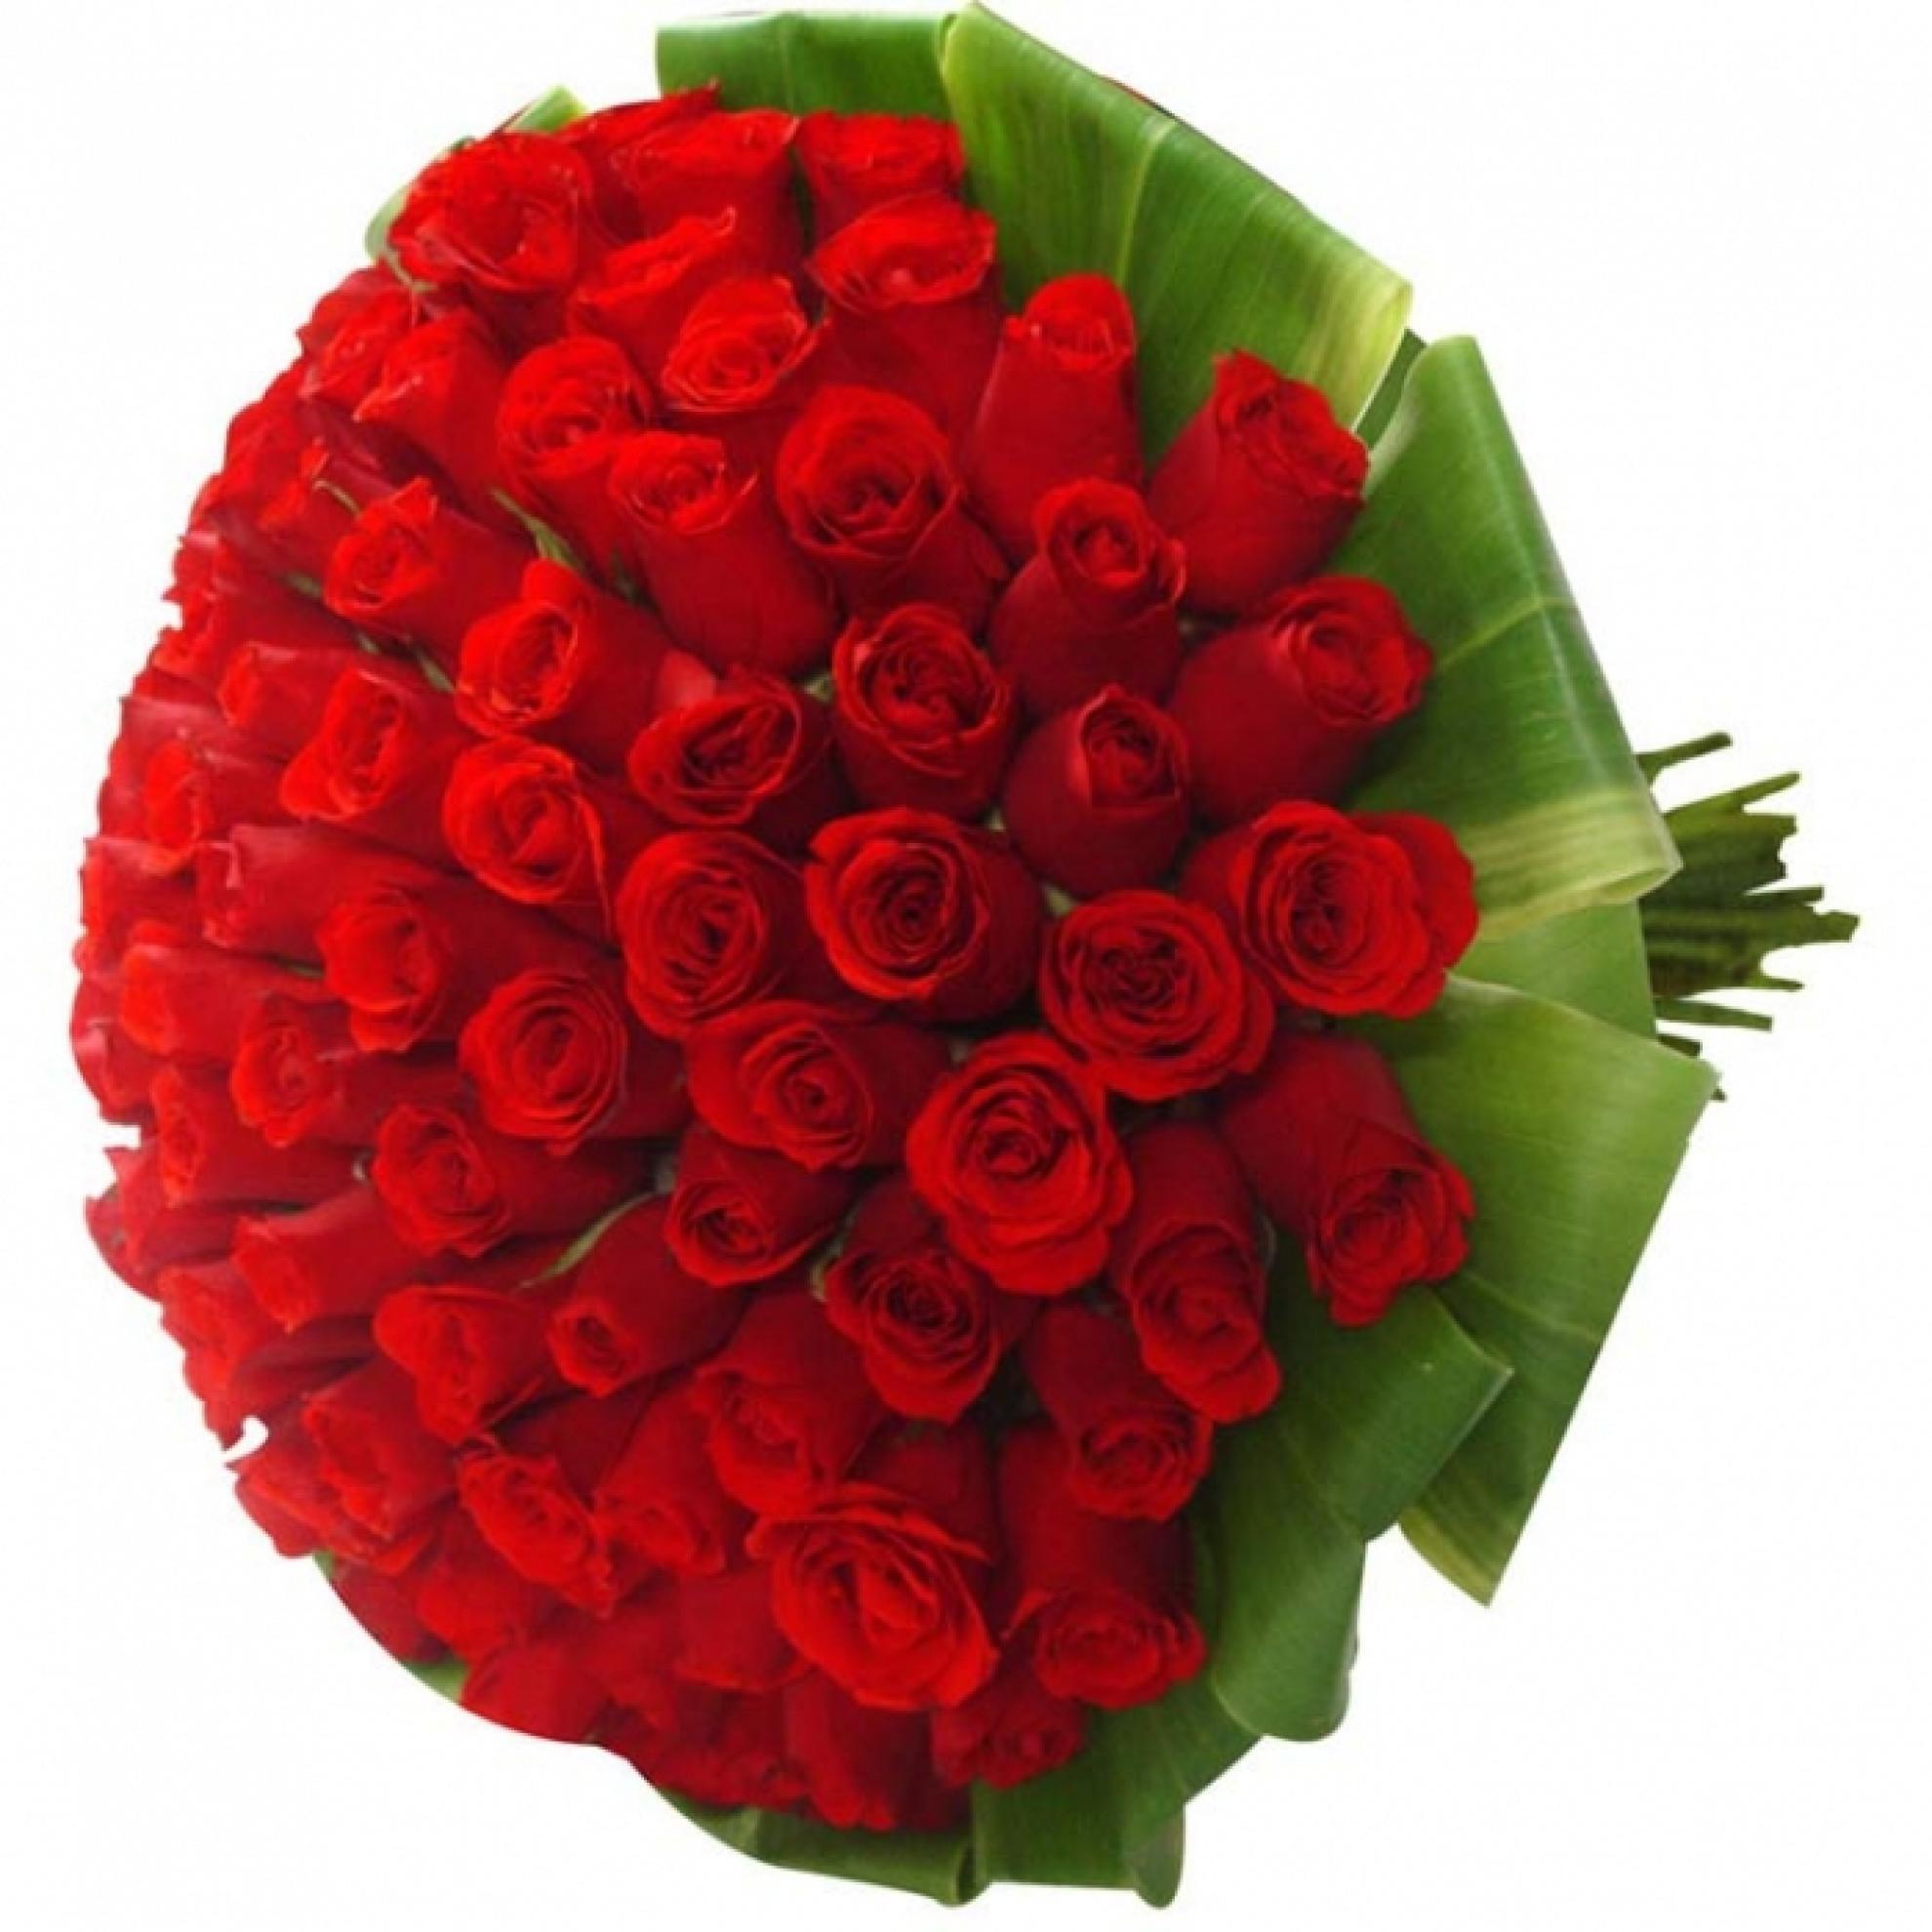 Buqu� 100 Rosas - BR01